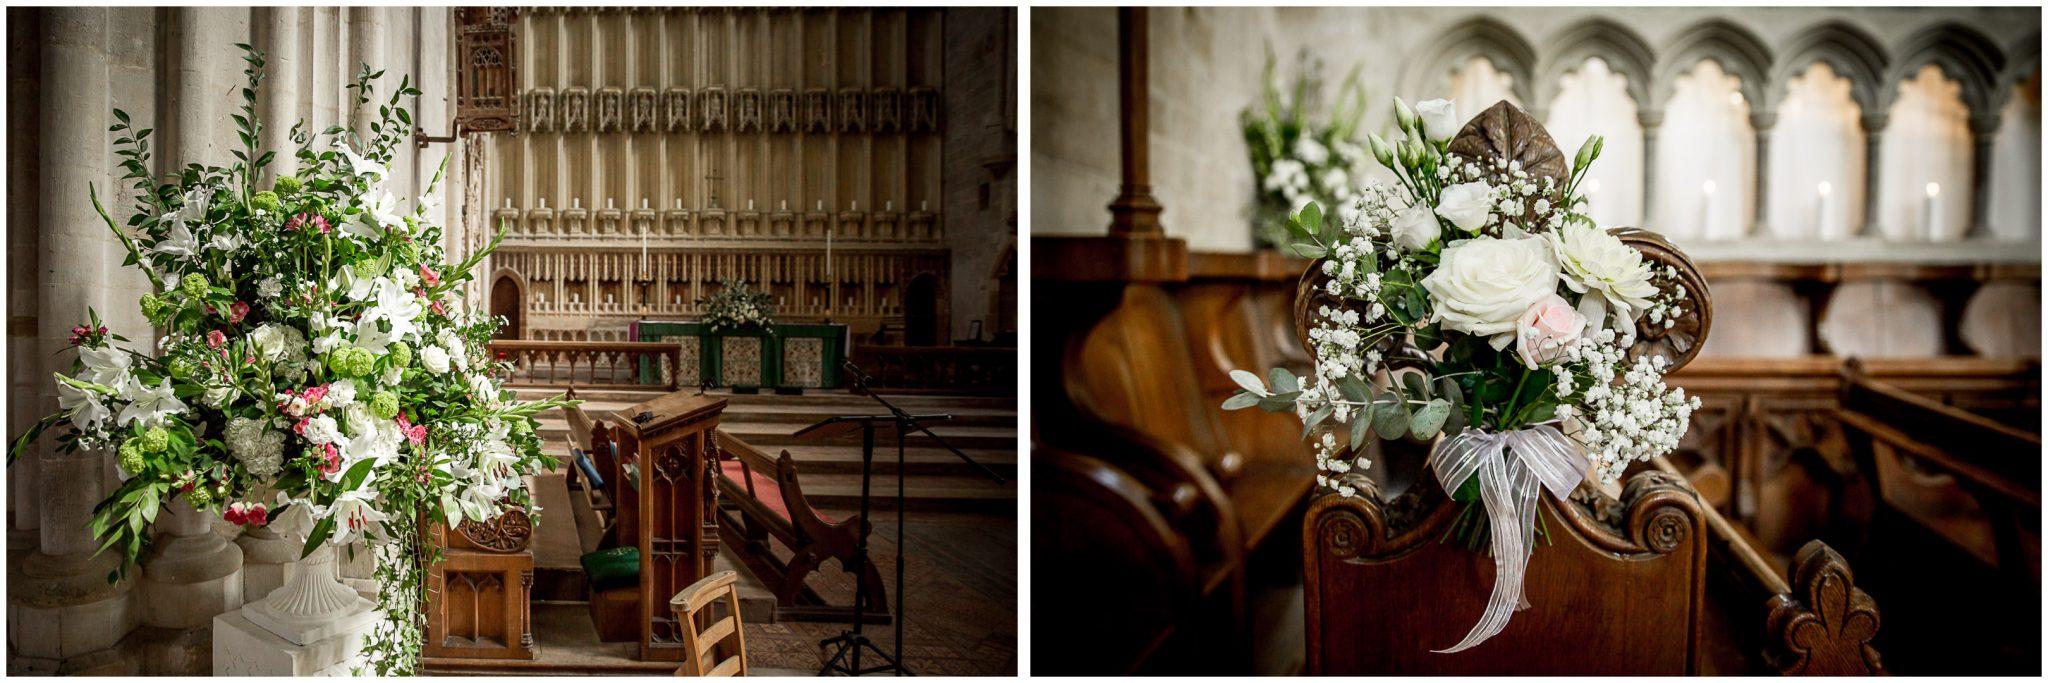 Floral details church interior